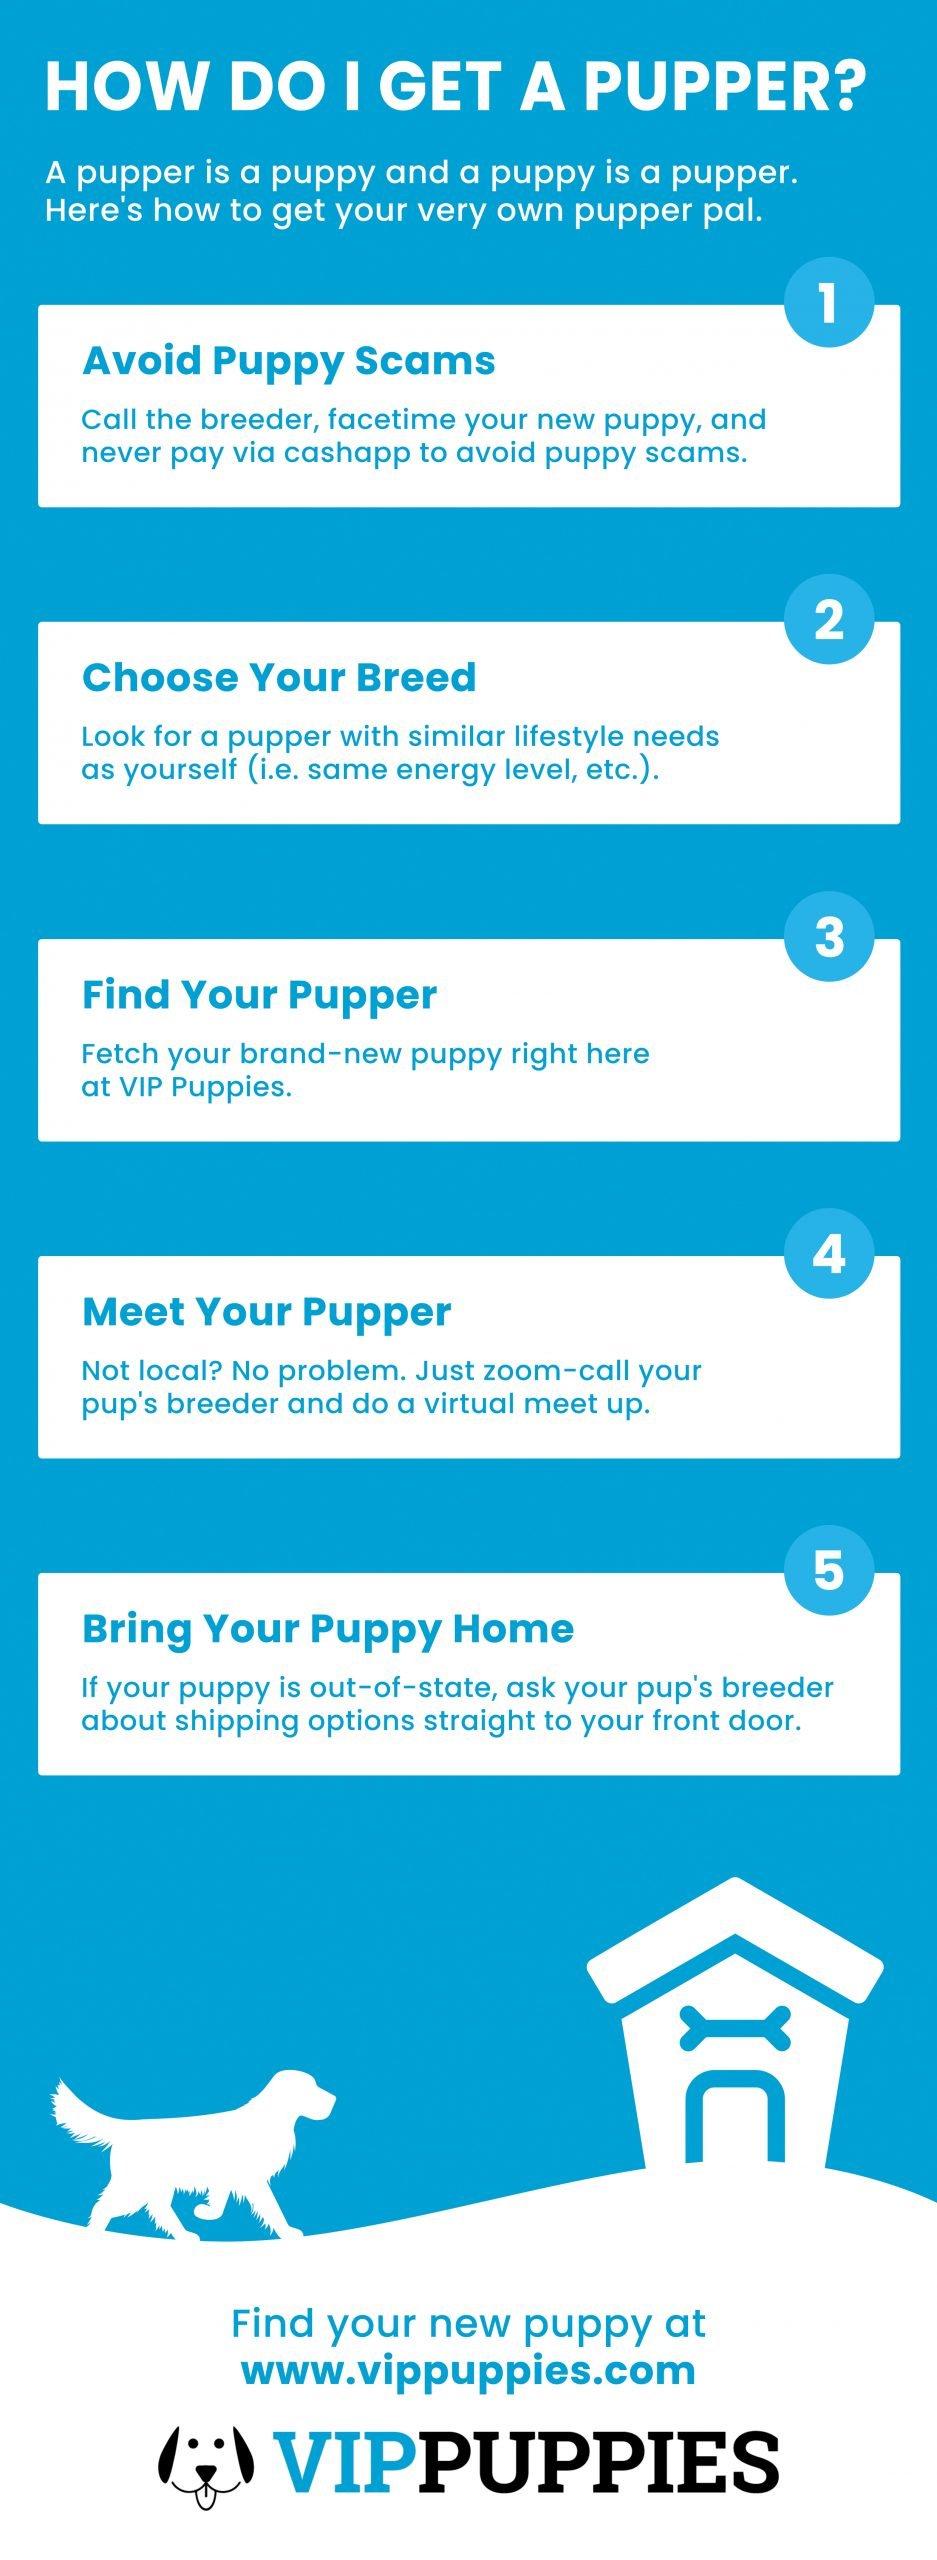 HOW DO I GET A PUPPER INFOGRAPHIC